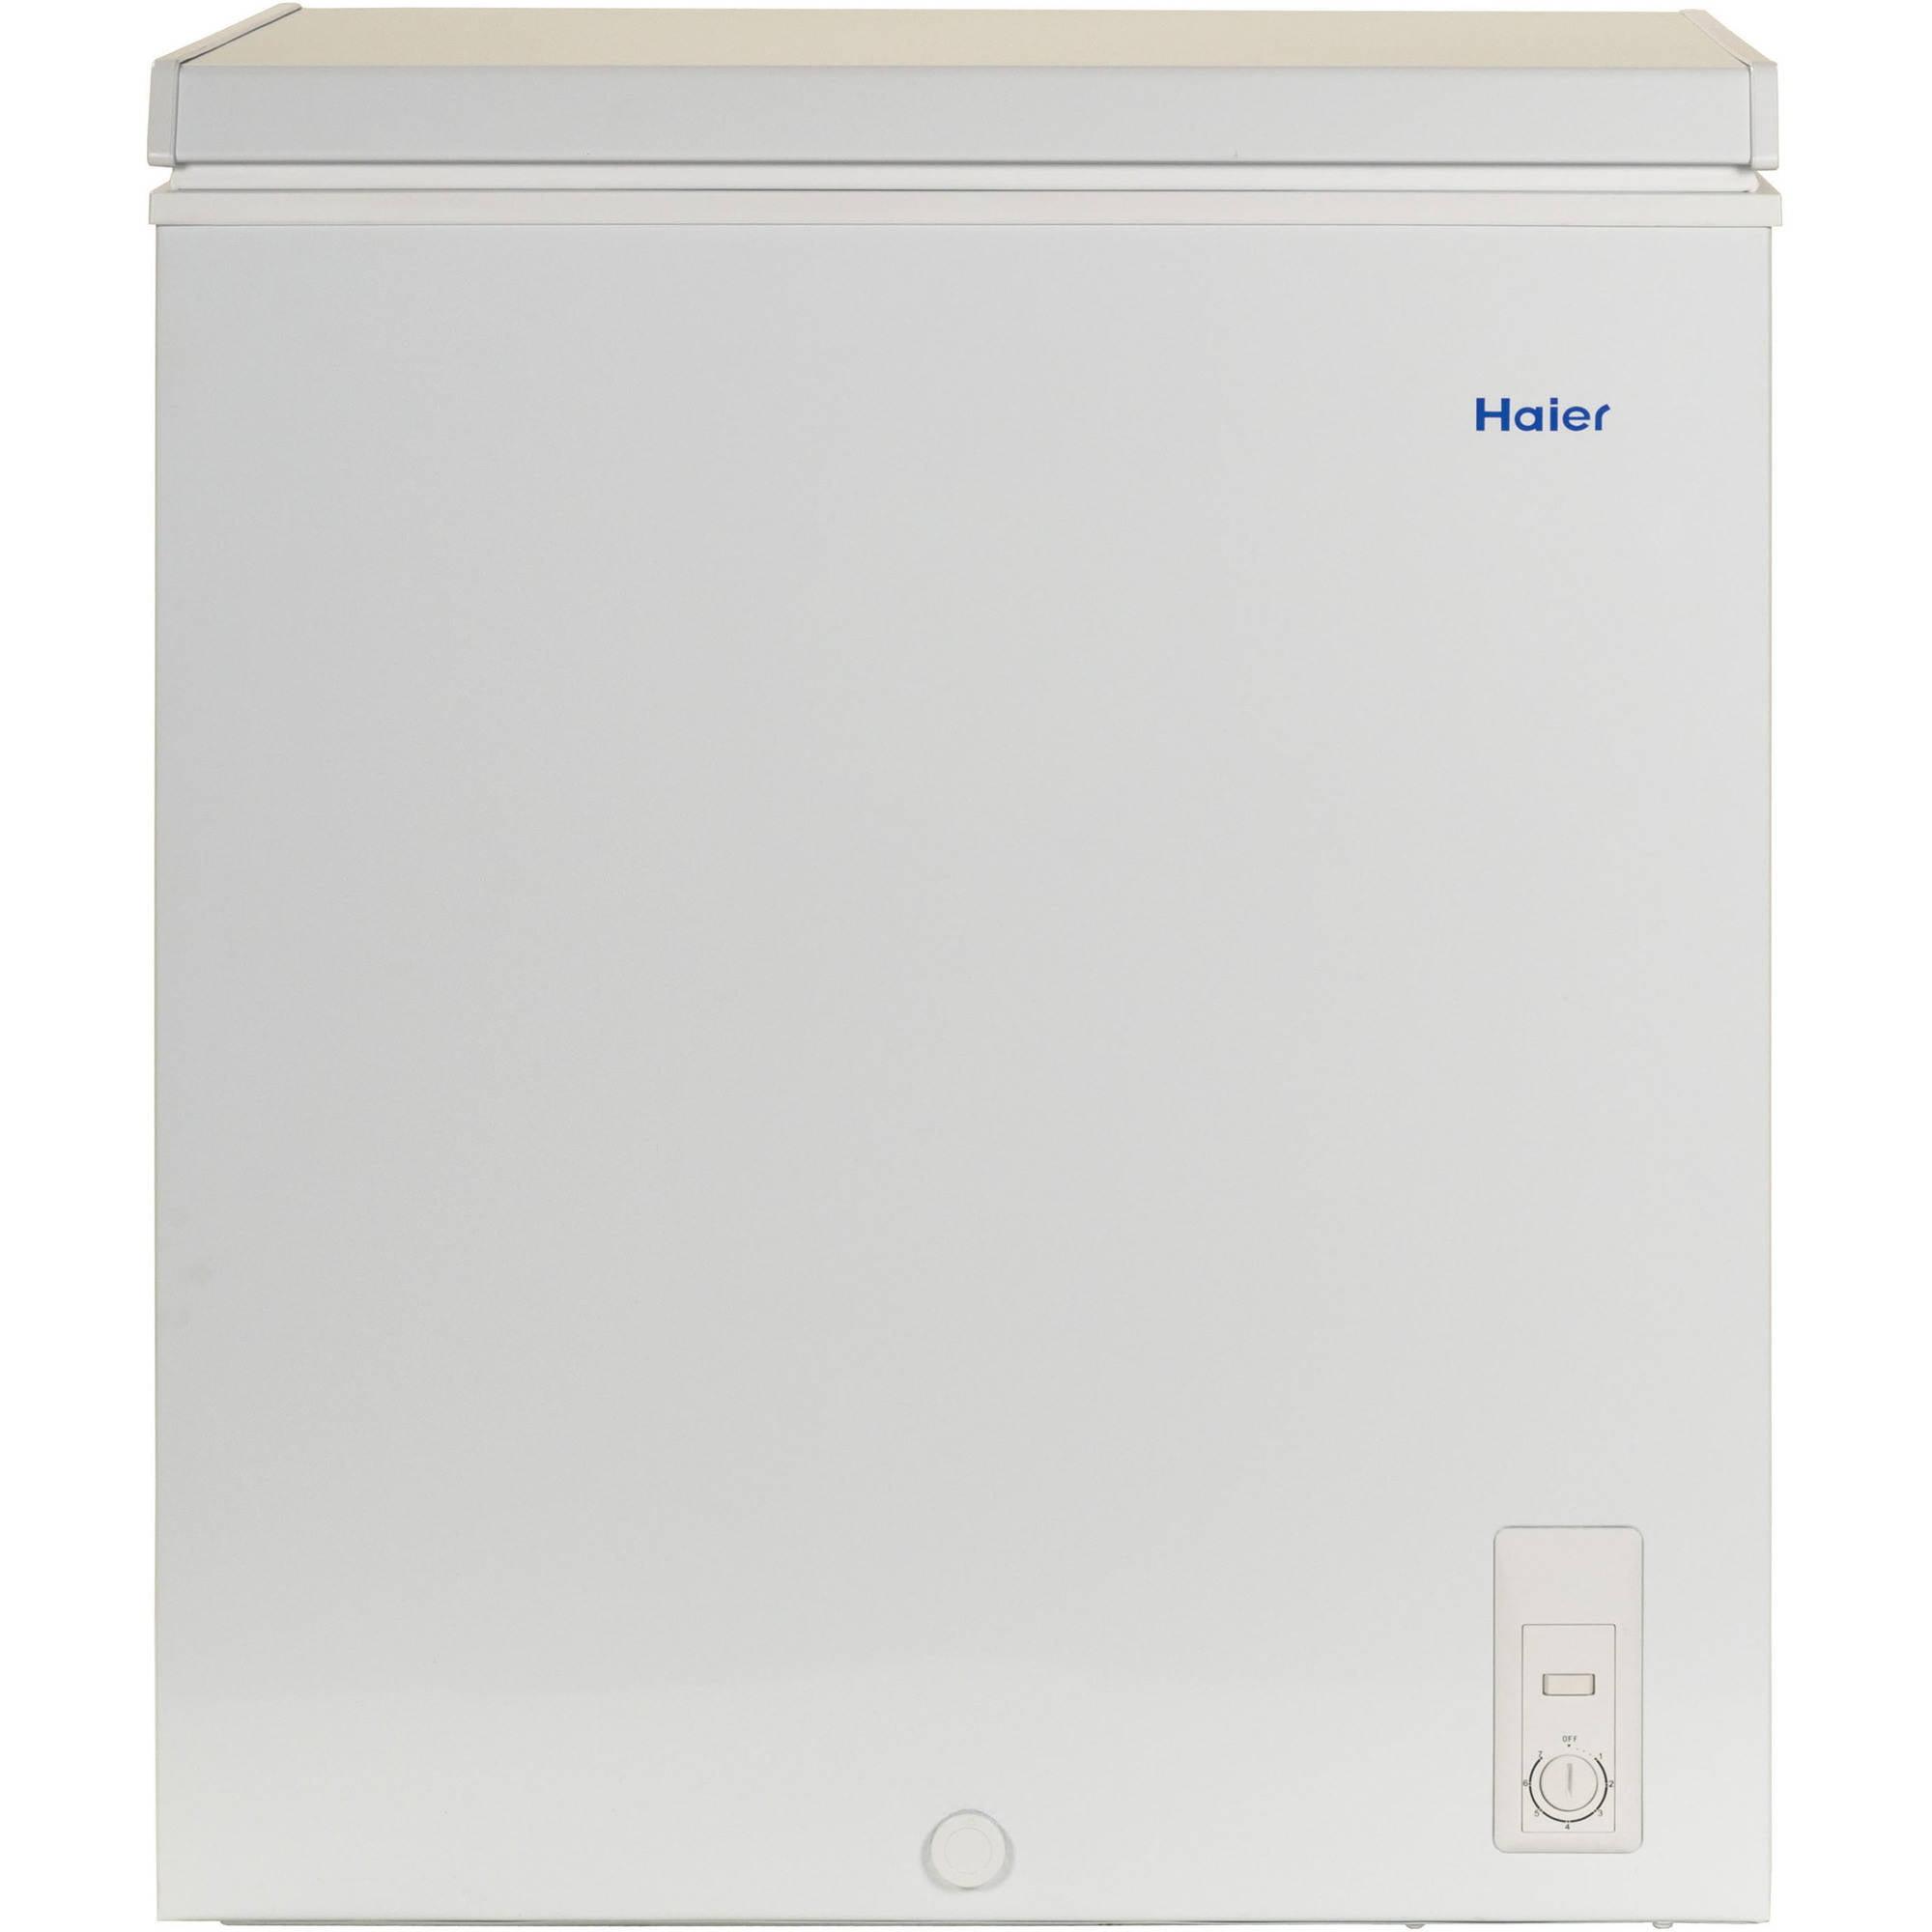 Haier 5.0 Cuft Compact Chest Freezer